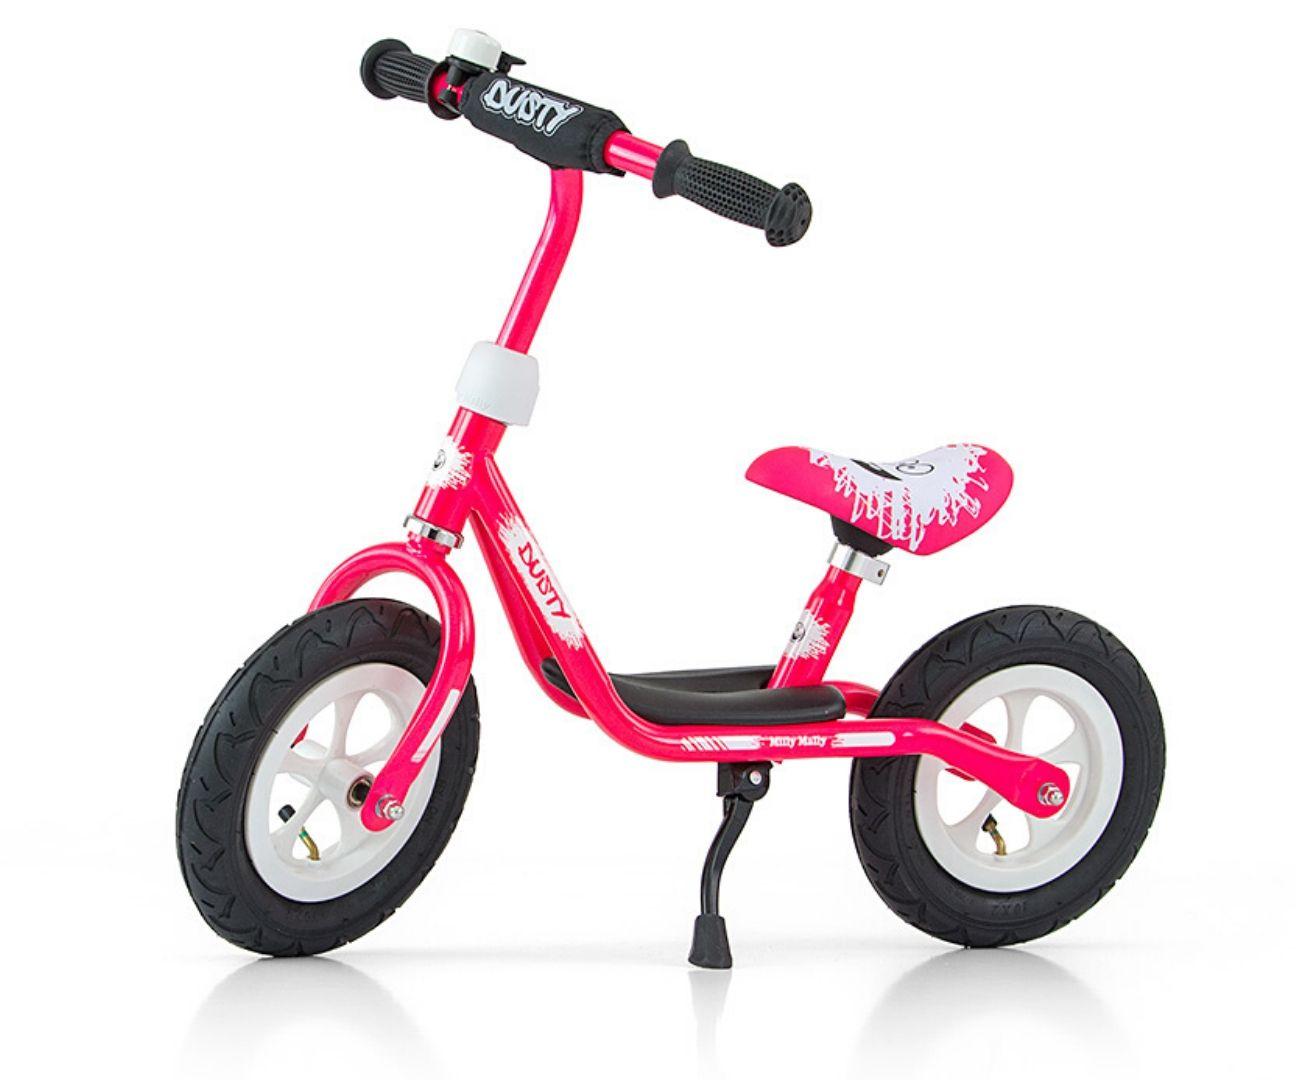 Milly Mally jooksuratas Dusty 10 tolli Pink-White